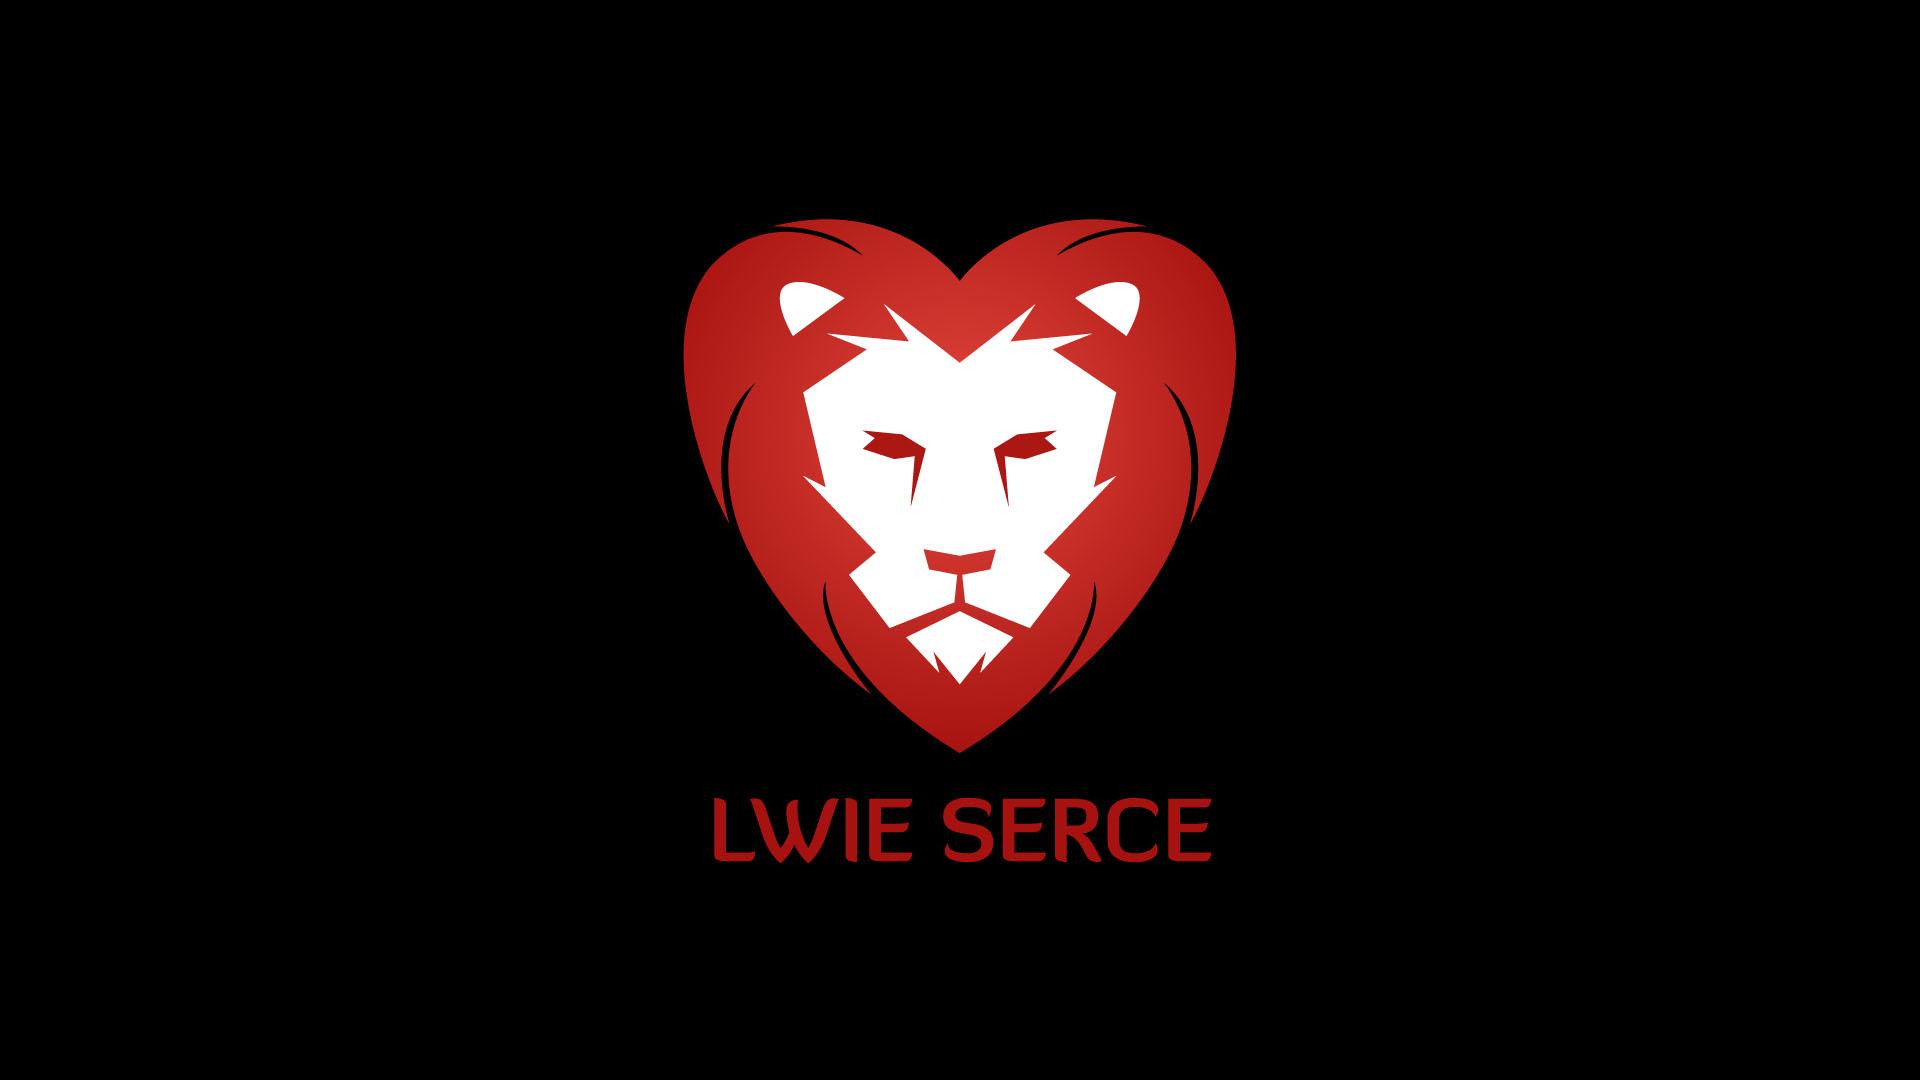 Lwie Serce